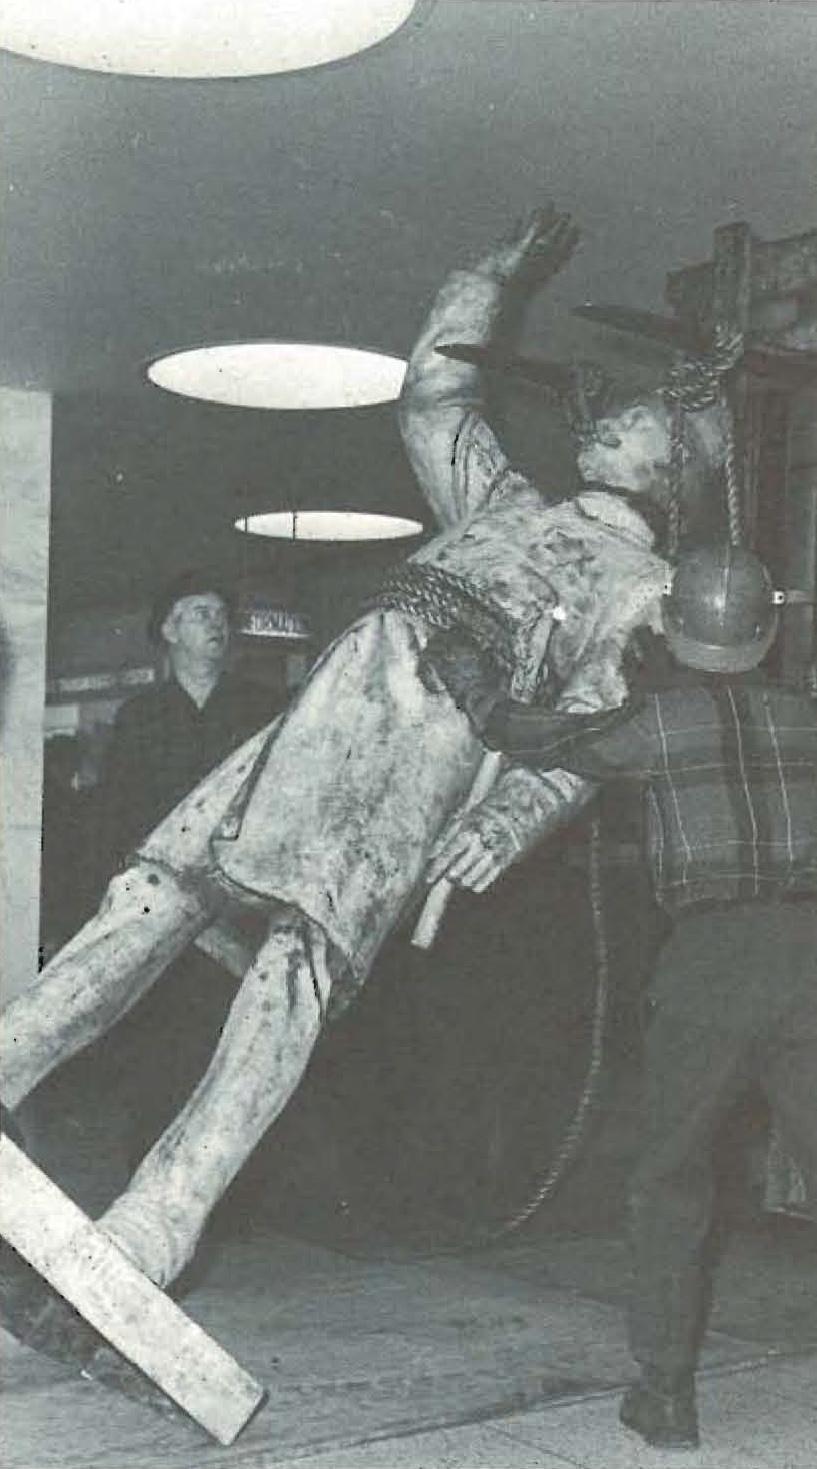 Haymarket Statue at State Street Police Headquarters Workman Raising Statue - 1972